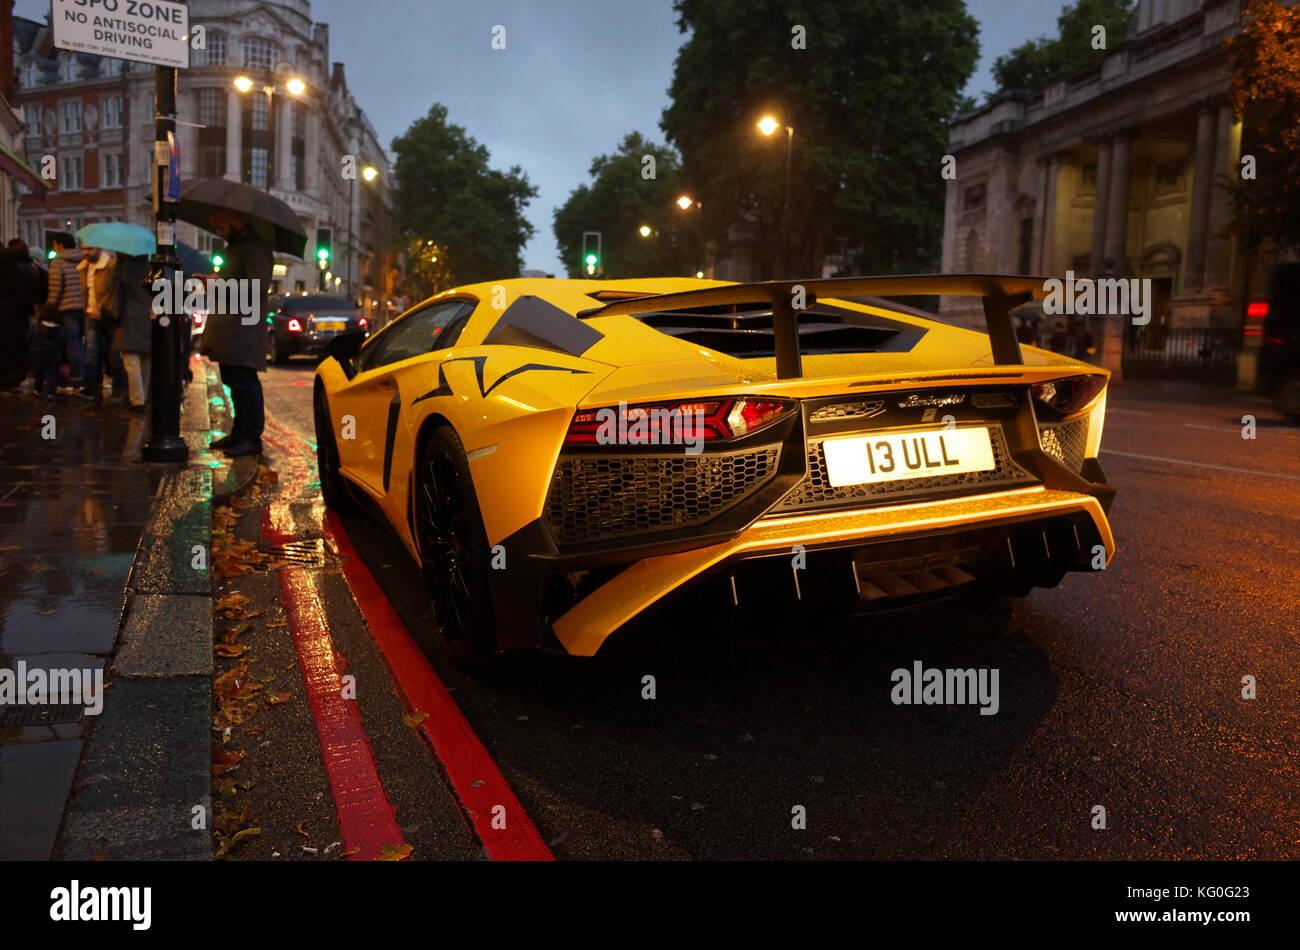 yellow-lamborghini-parked-in-kensington-london-england-KG0G23.jpg